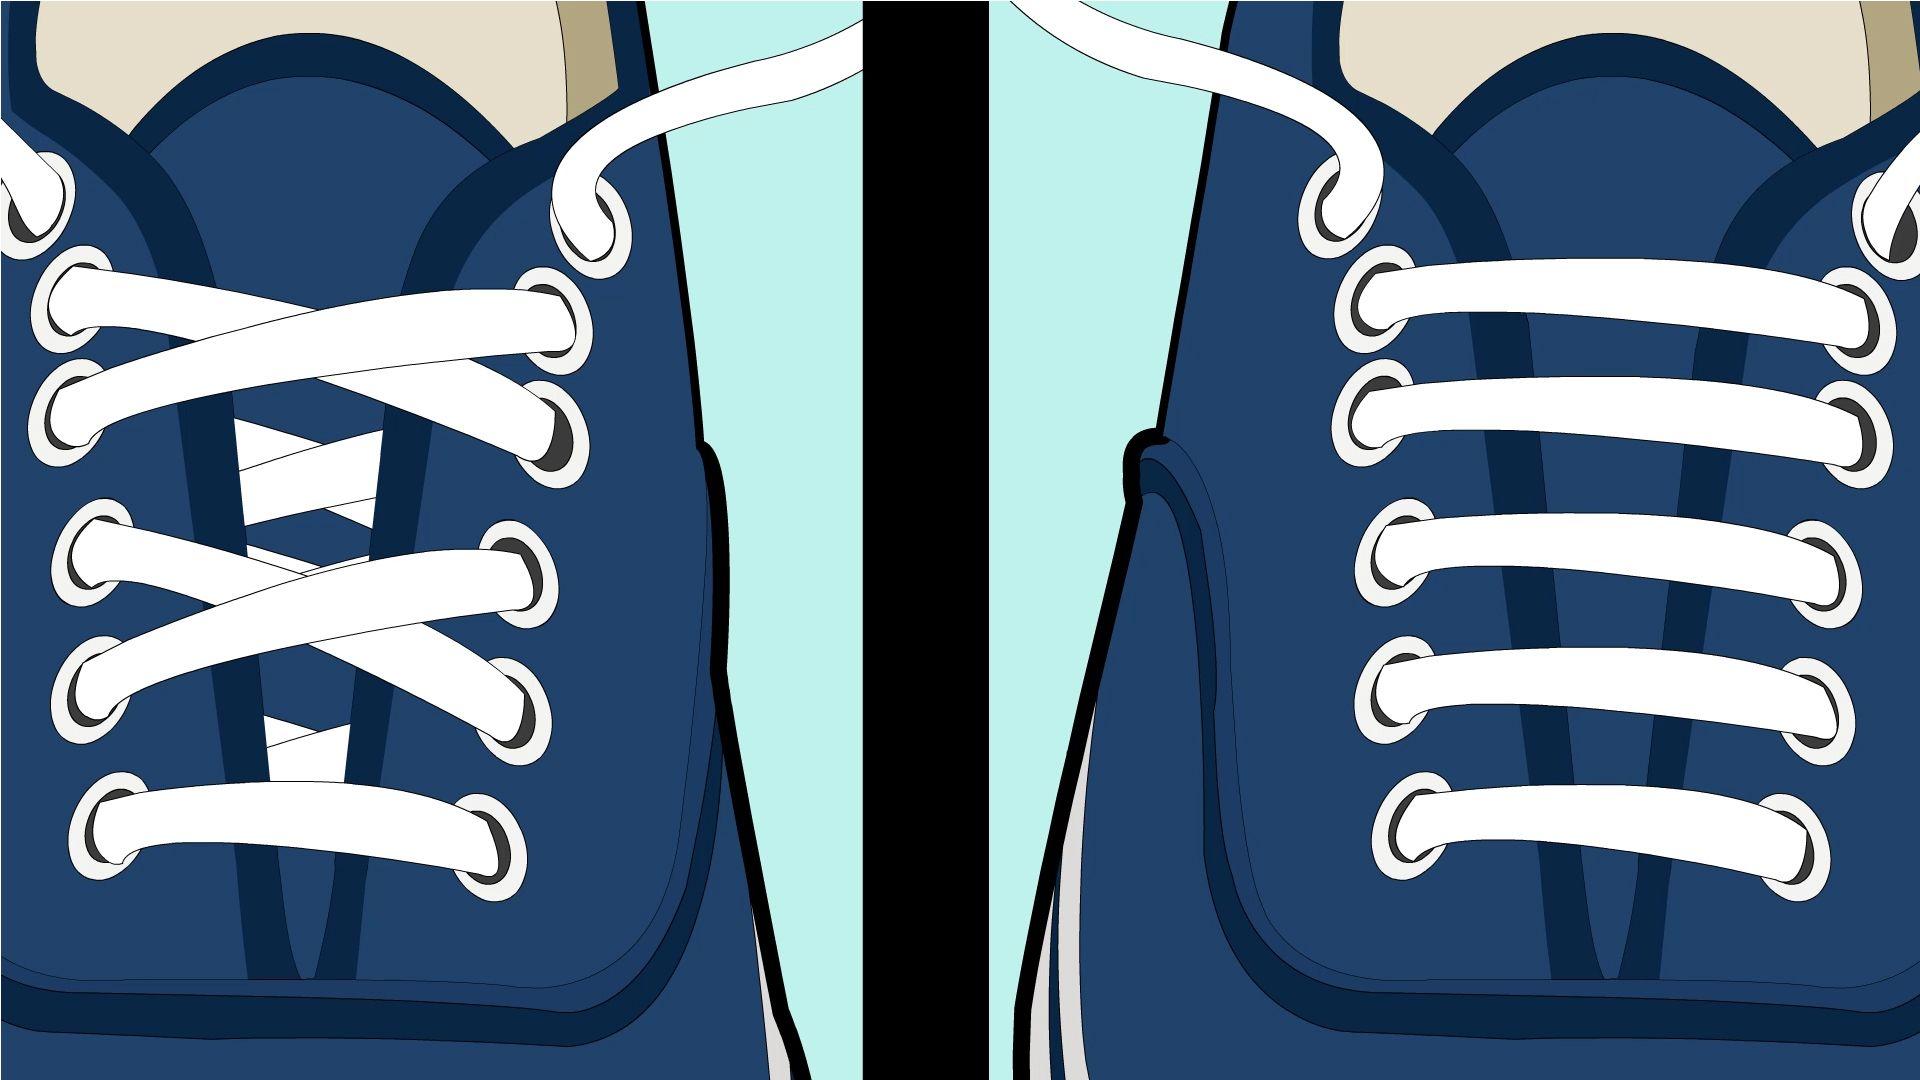 Lace Vans Shoes How to lace vans, Ways to lace shoes